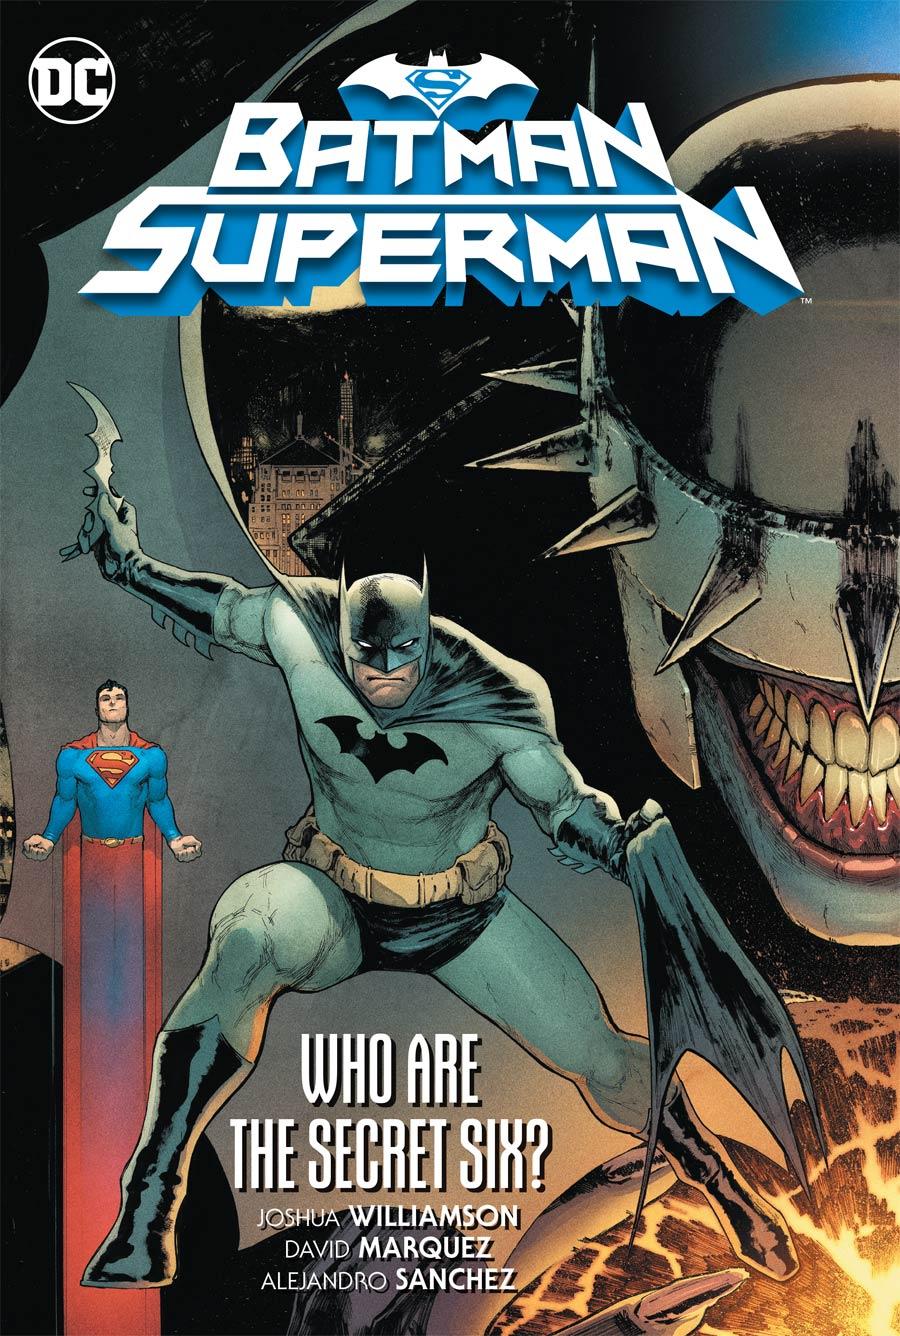 Batman Superman (2019) Vol 1 Who Are The Secret Six TP